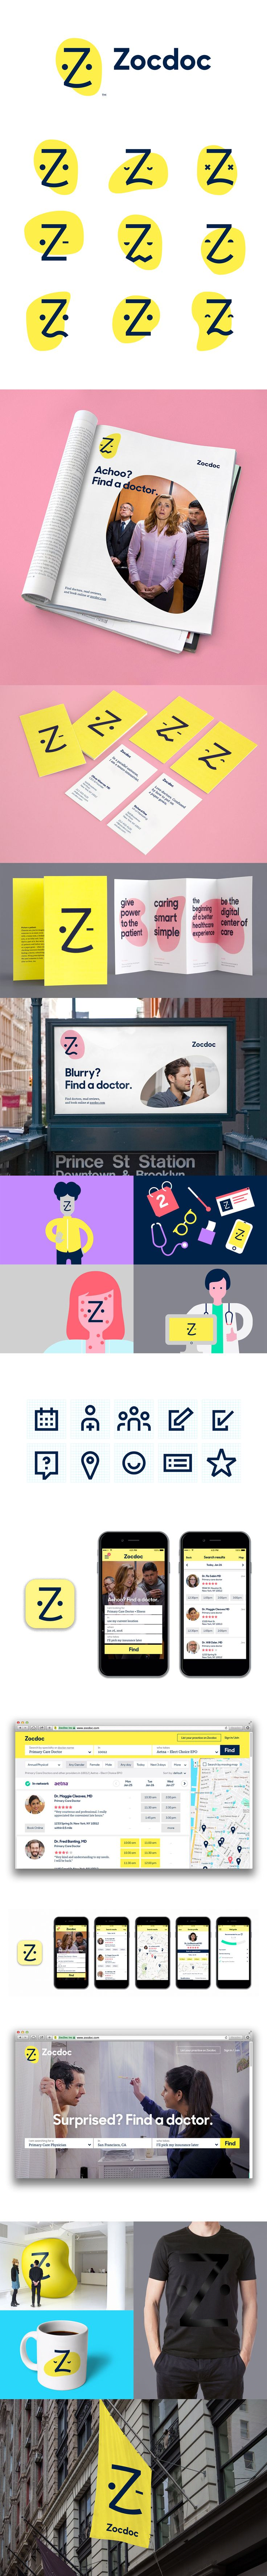 147 best fresh2design look images on Pinterest